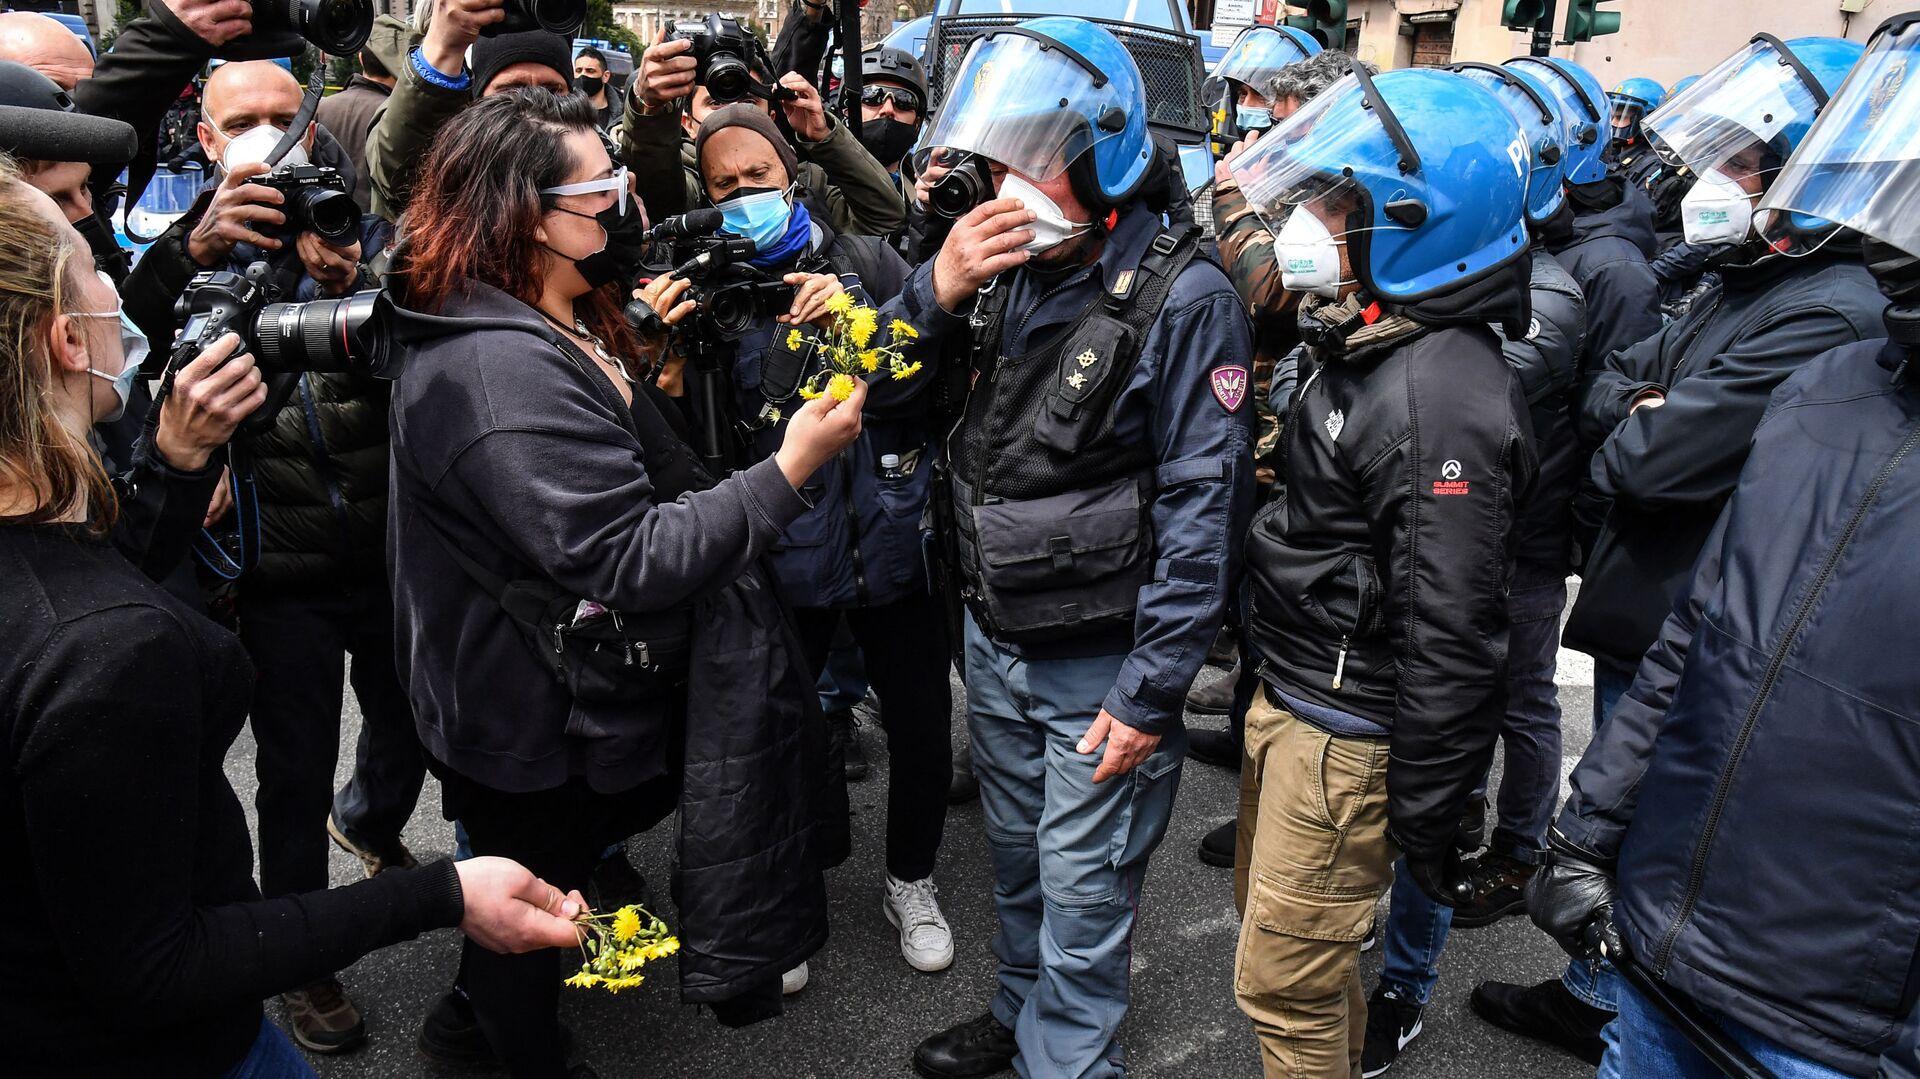 Proteste dei ristoratori a Roma, 13 aprile 2021 - Sputnik Italia, 1920, 08.07.2021